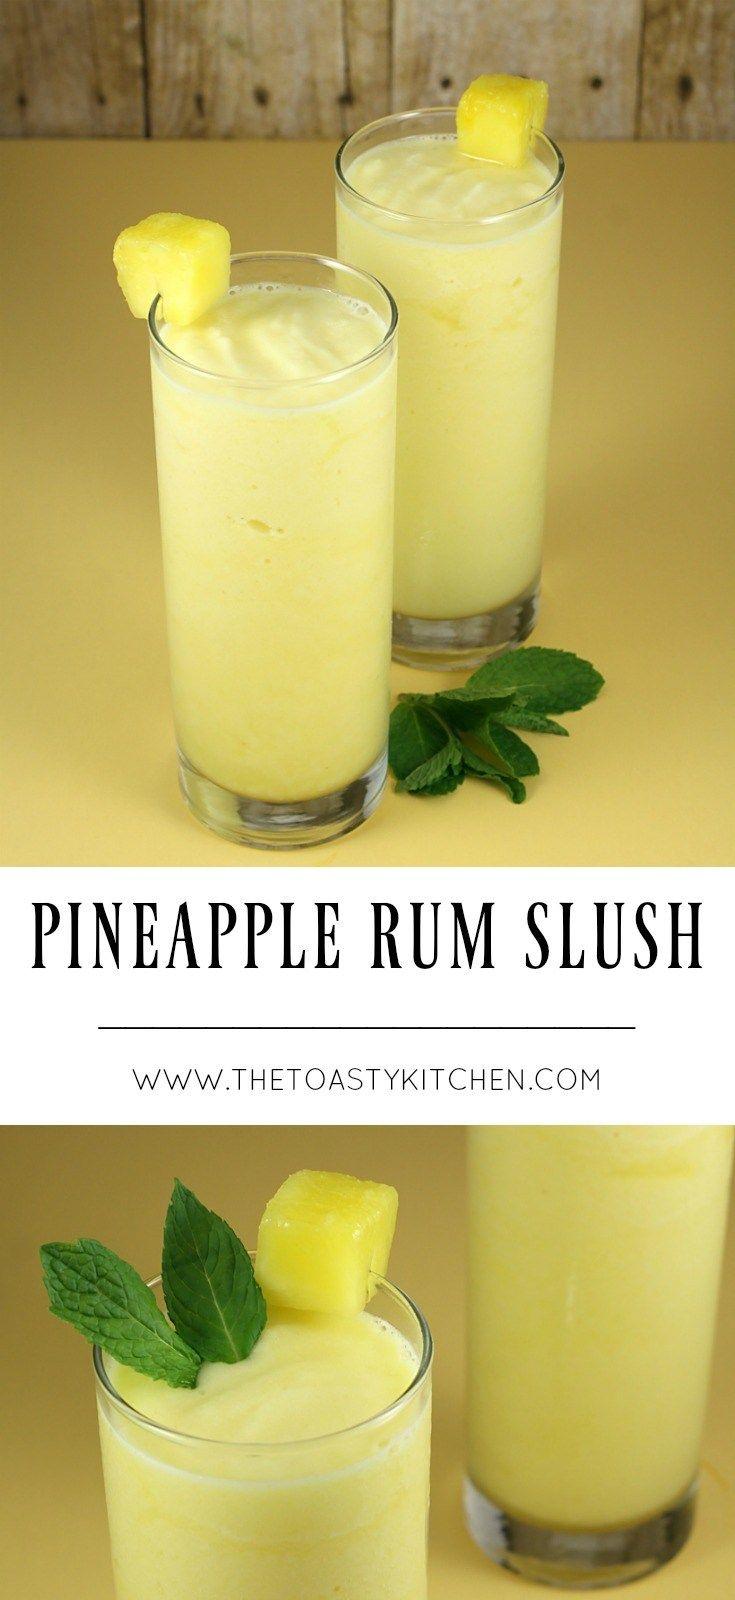 Pineapple Rum Slush by The Toasty Kitchen